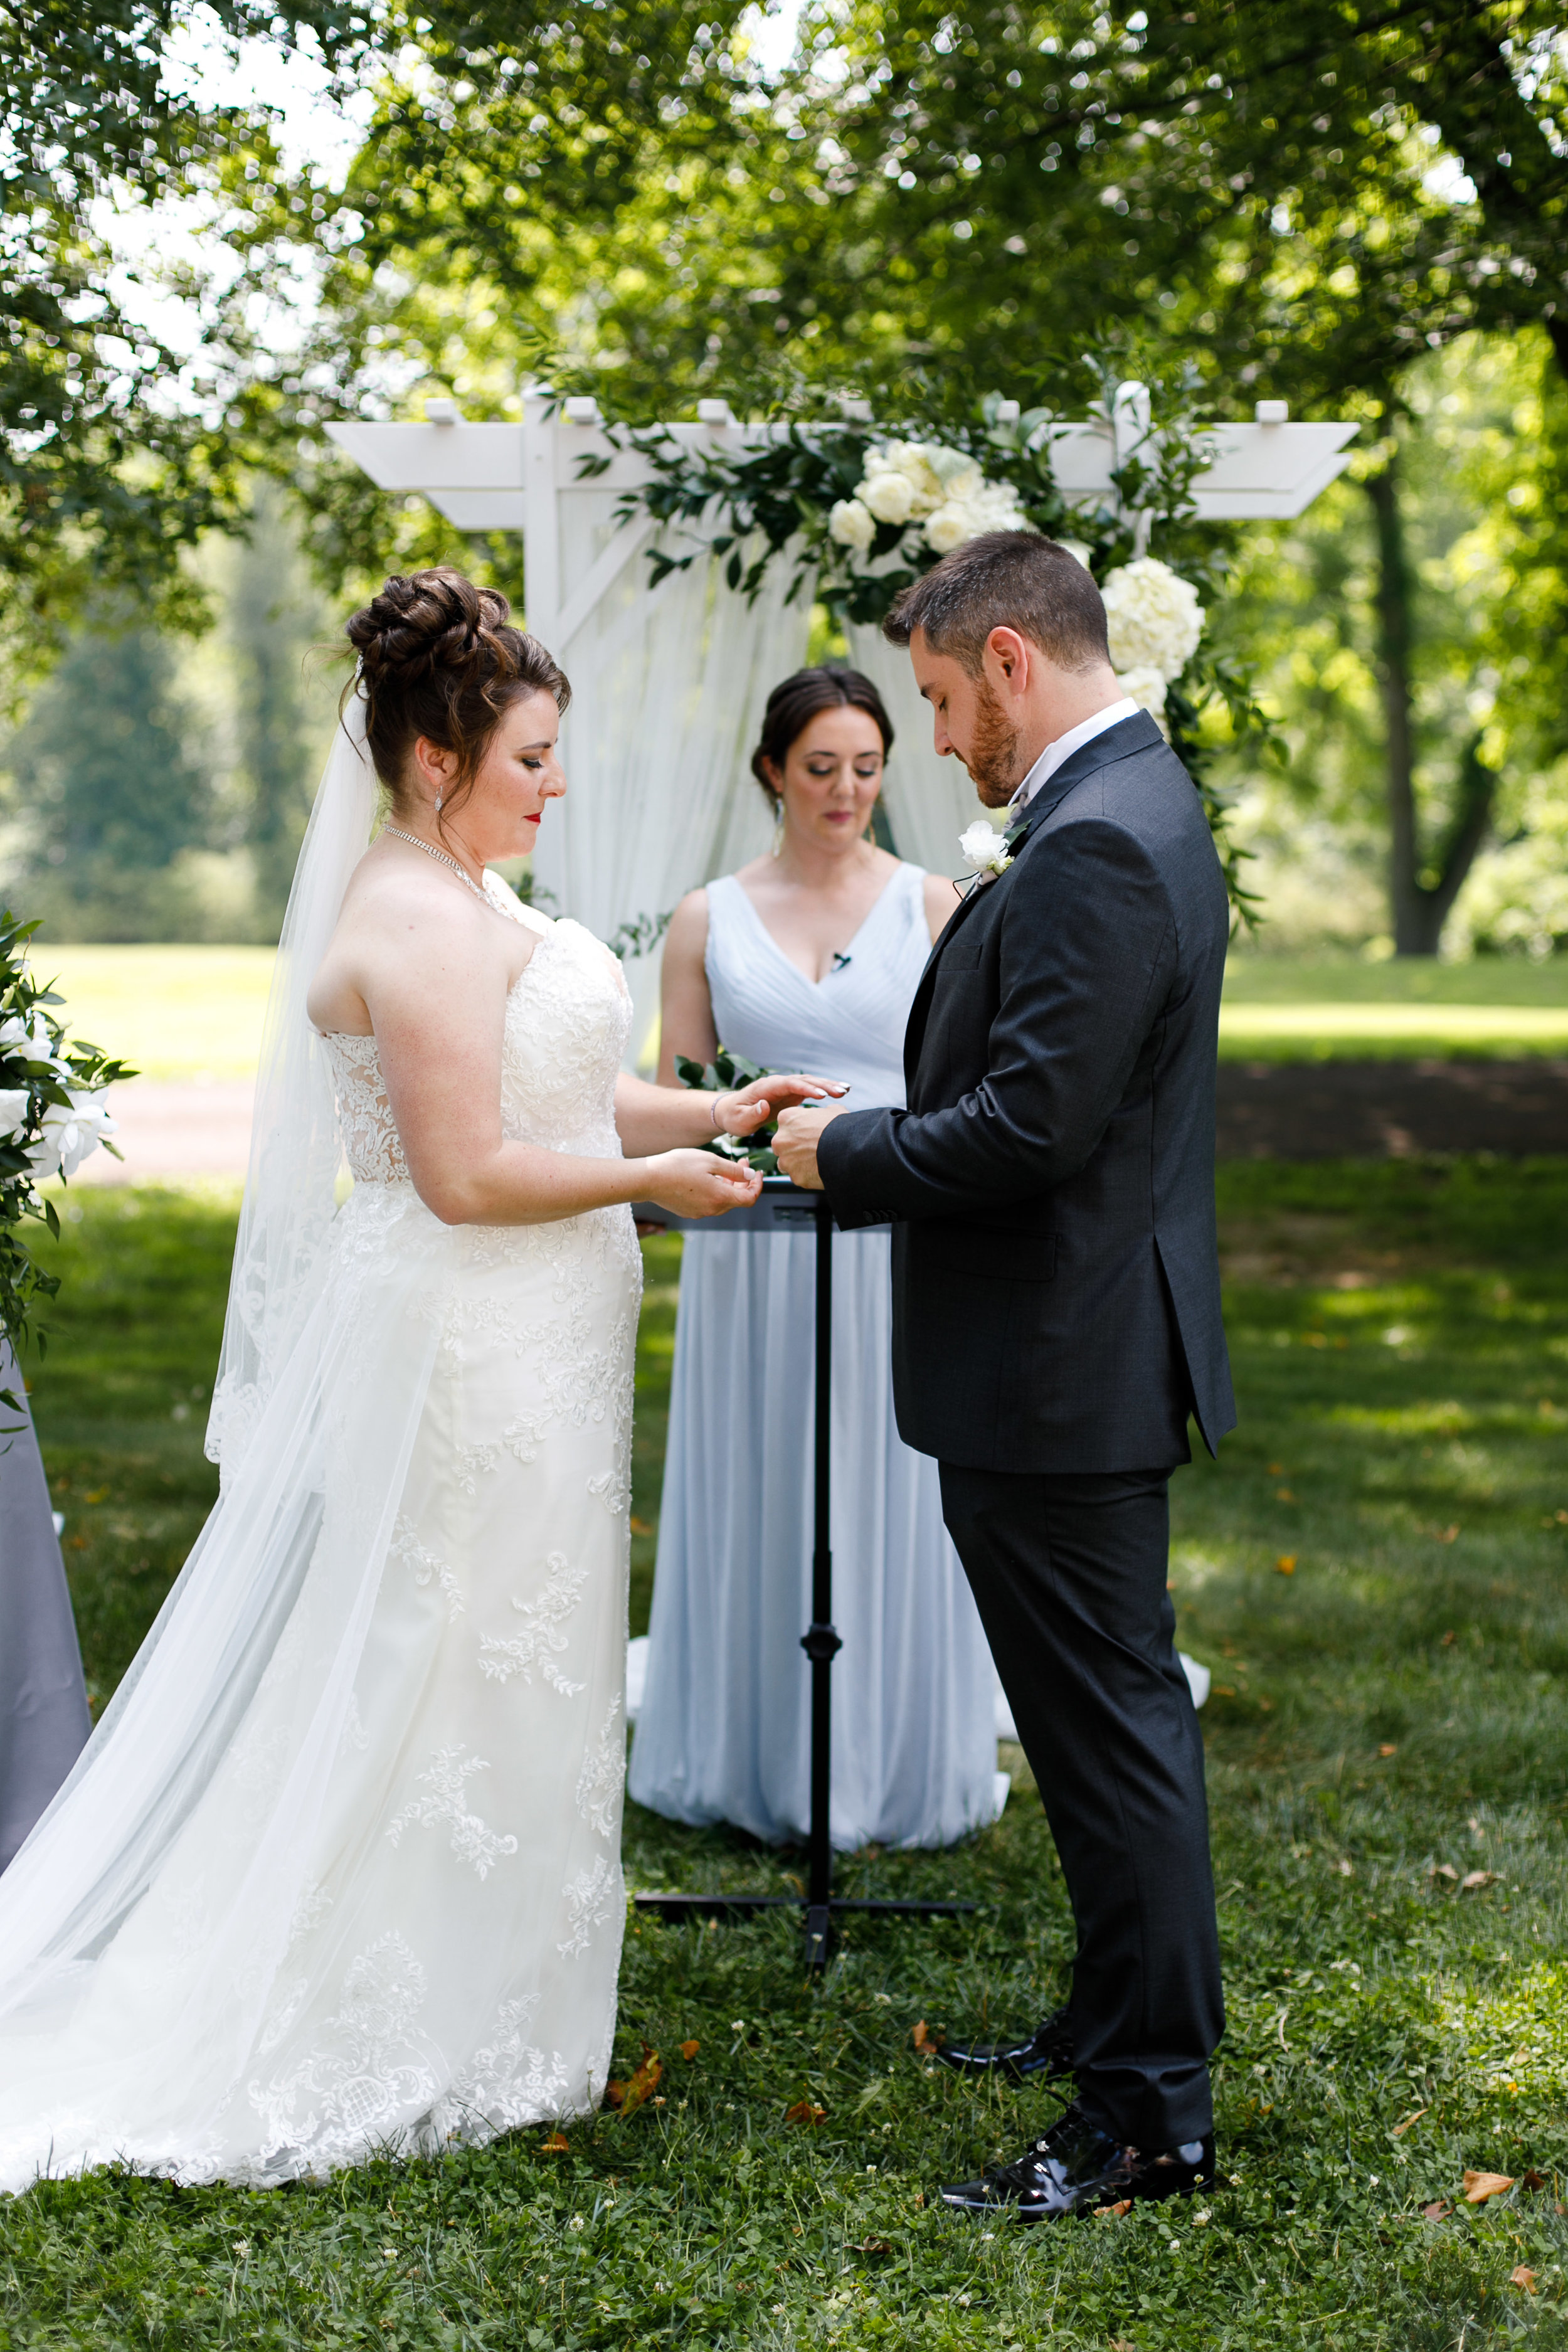 Wedding at Joseph Ambler In Bucks County PA32.jpg